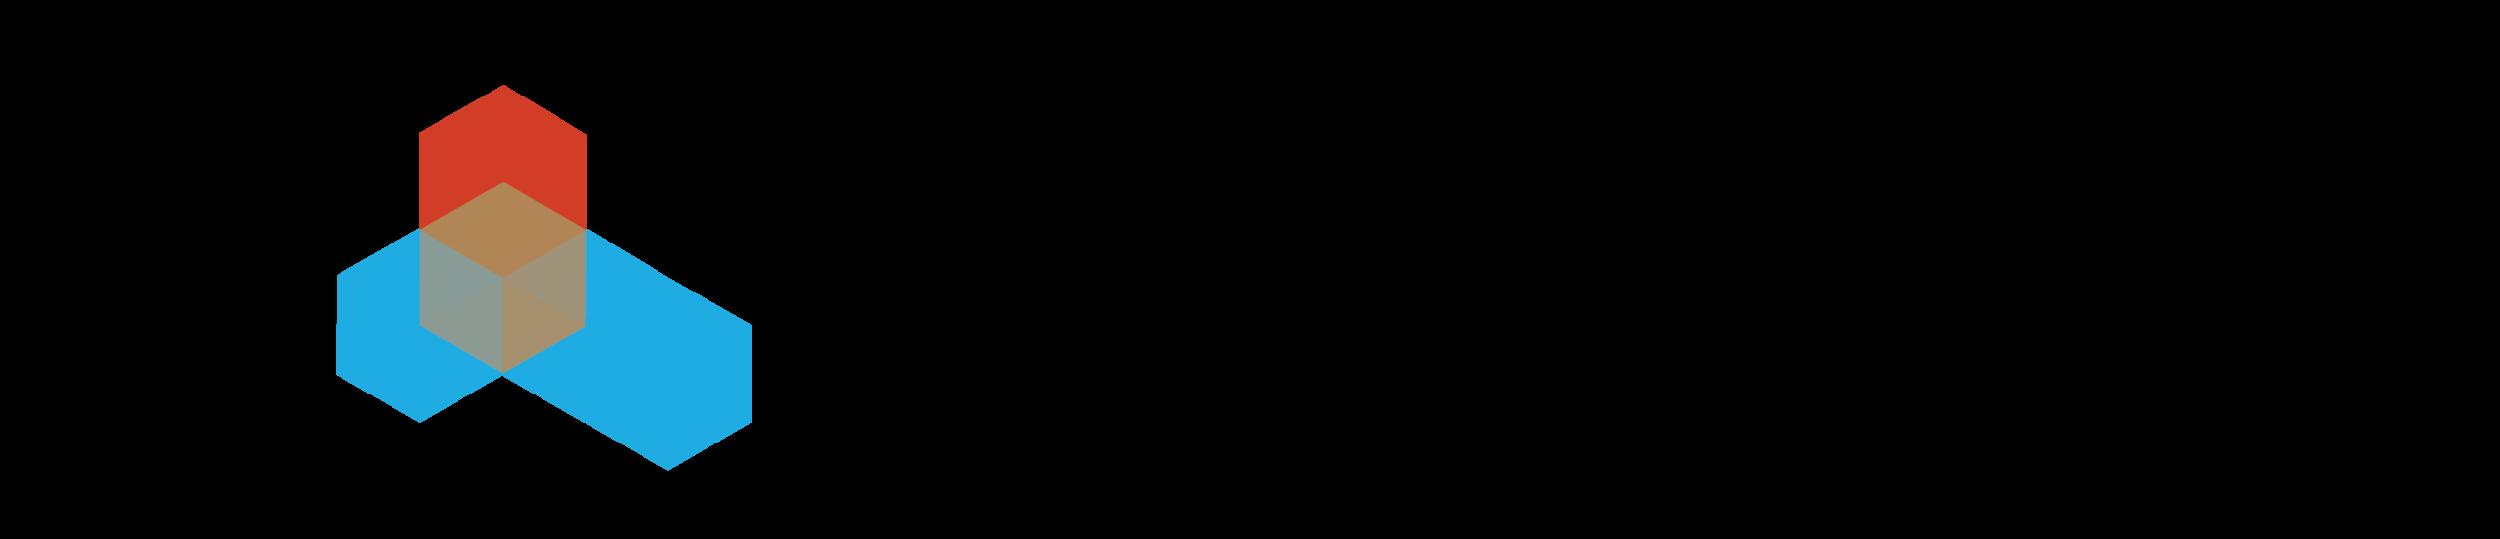 EMC_Logo-01.png